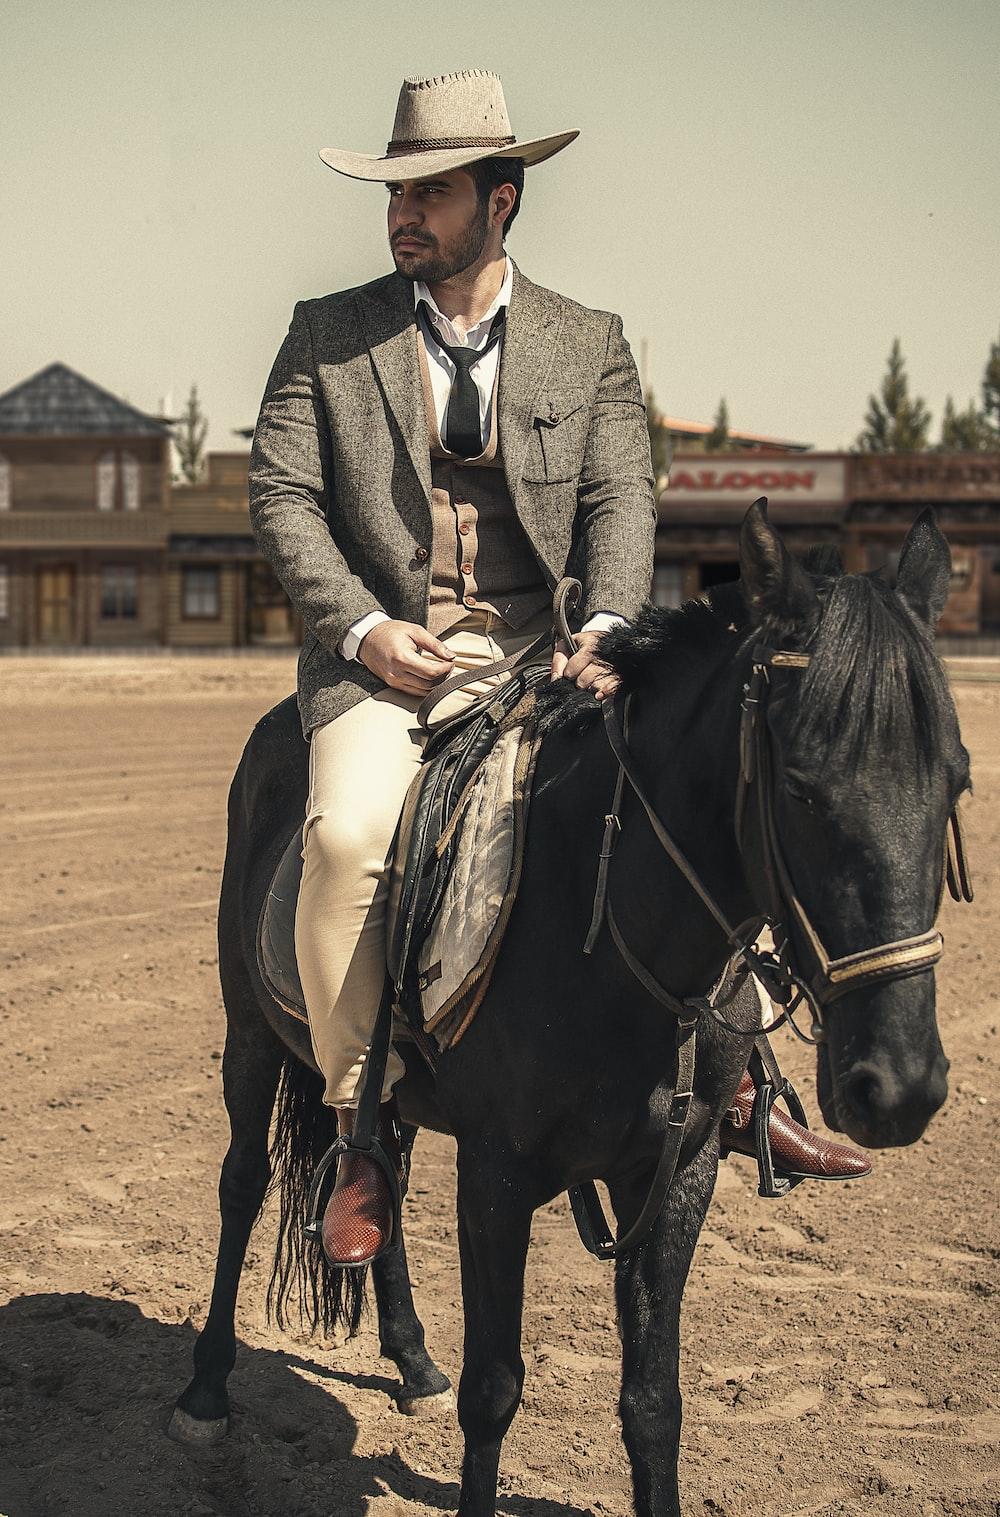 man in gray coat riding black horse during daytime